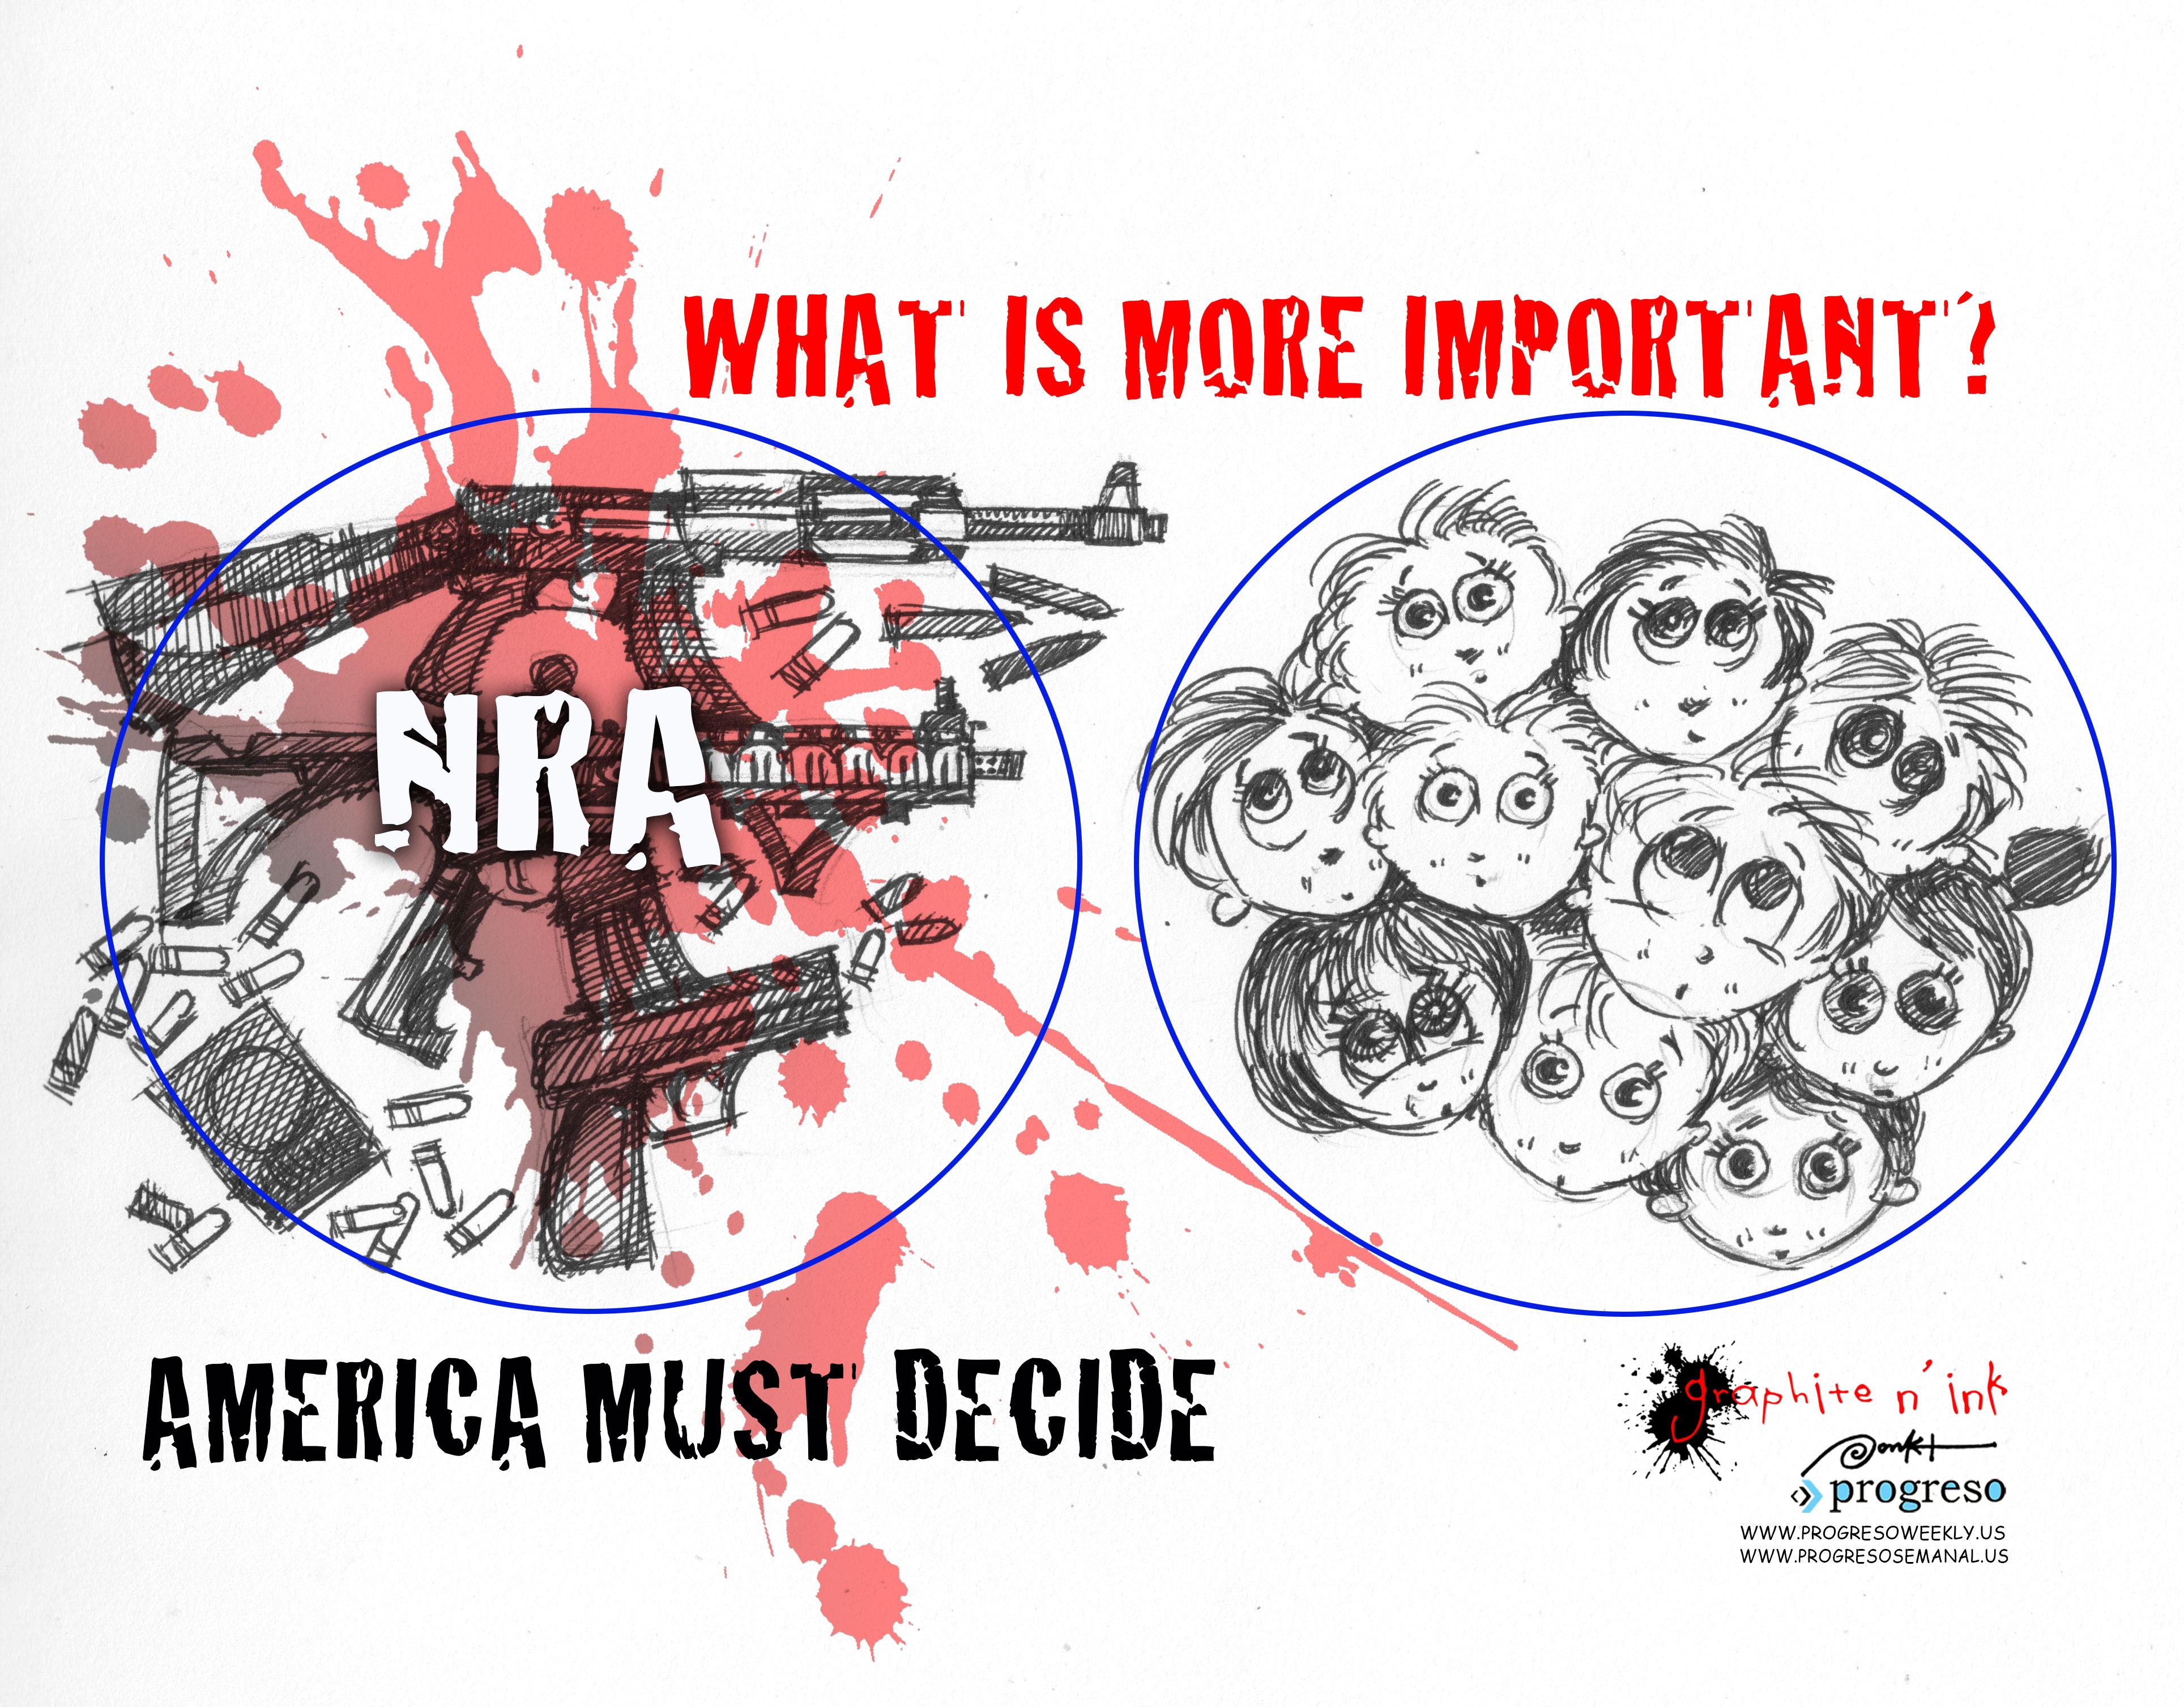 America must decide